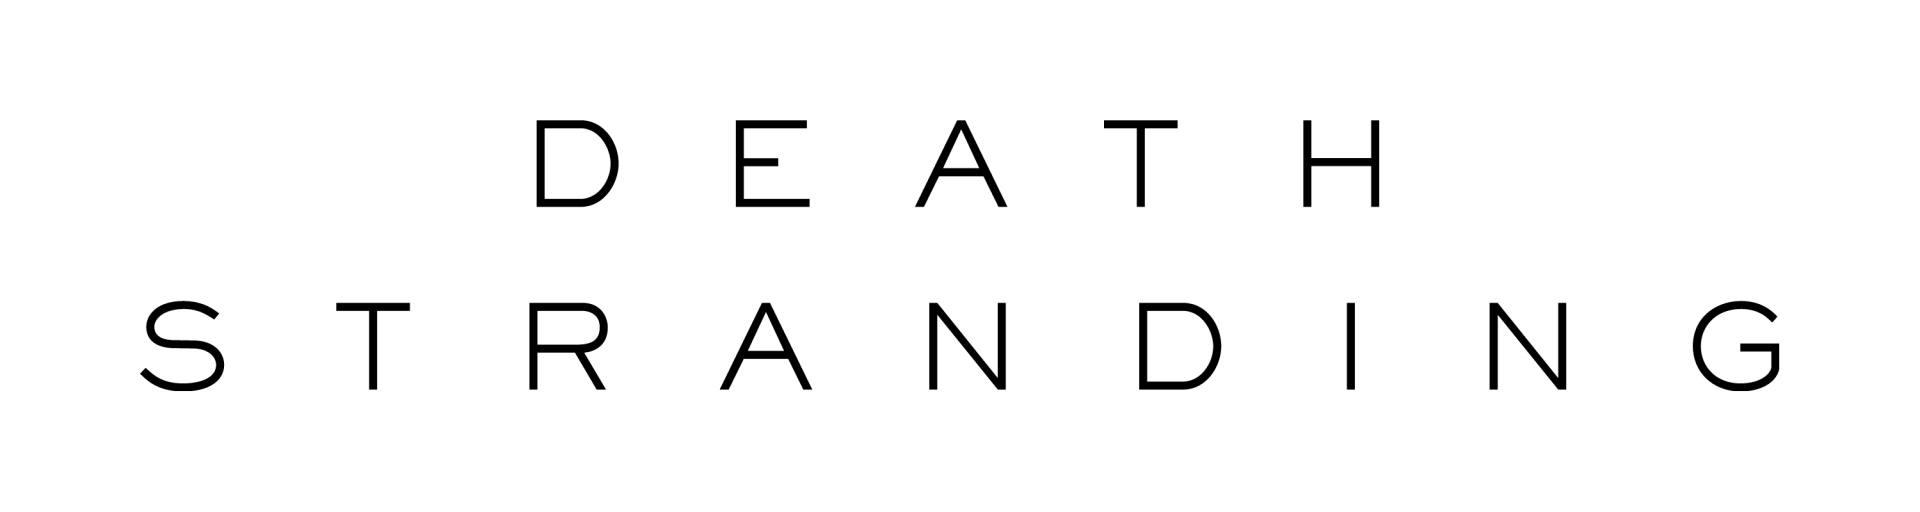 Death-Stranding_2016_06-13-16_012